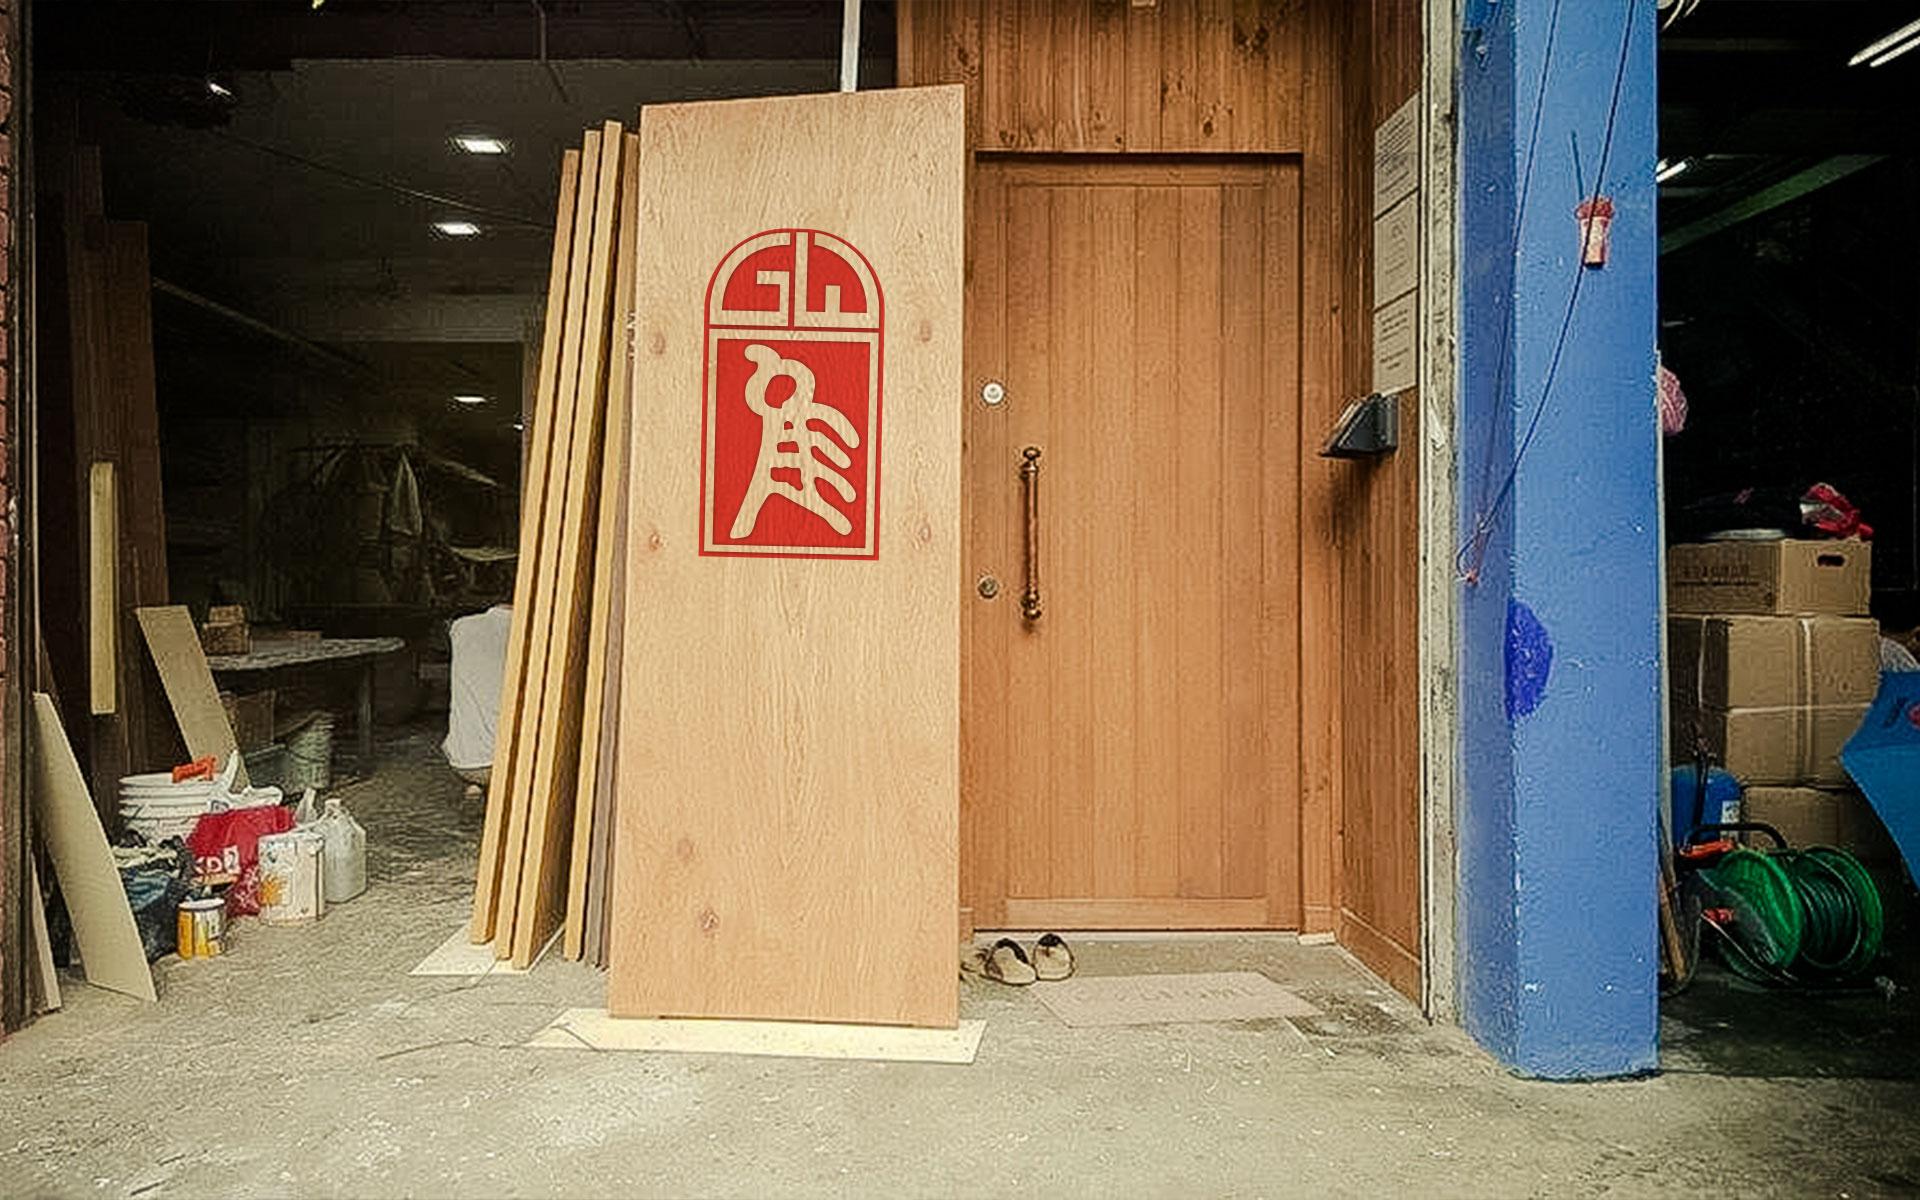 Goodwood Doors \u0026 Joinery Works & Good Wood Doors \u0026 Joinery Works | About Us